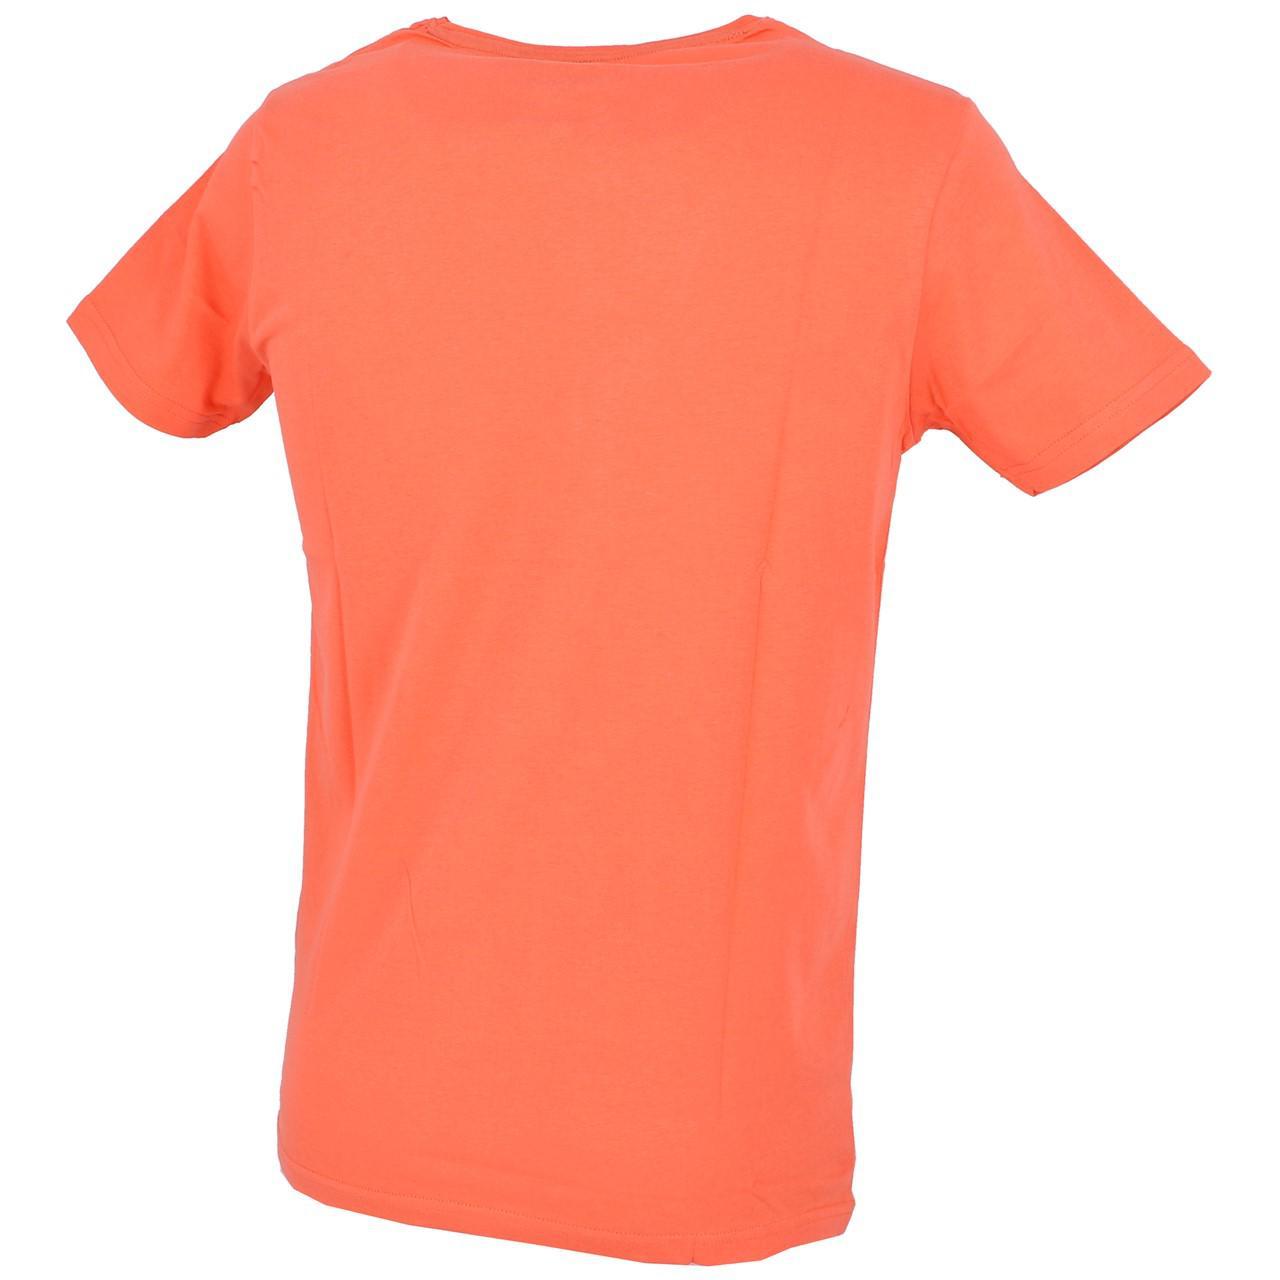 Short-La-maison-blaggio-Mably-Hot-Coral-Mc-Tee-Orange-93614 thumbnail 5